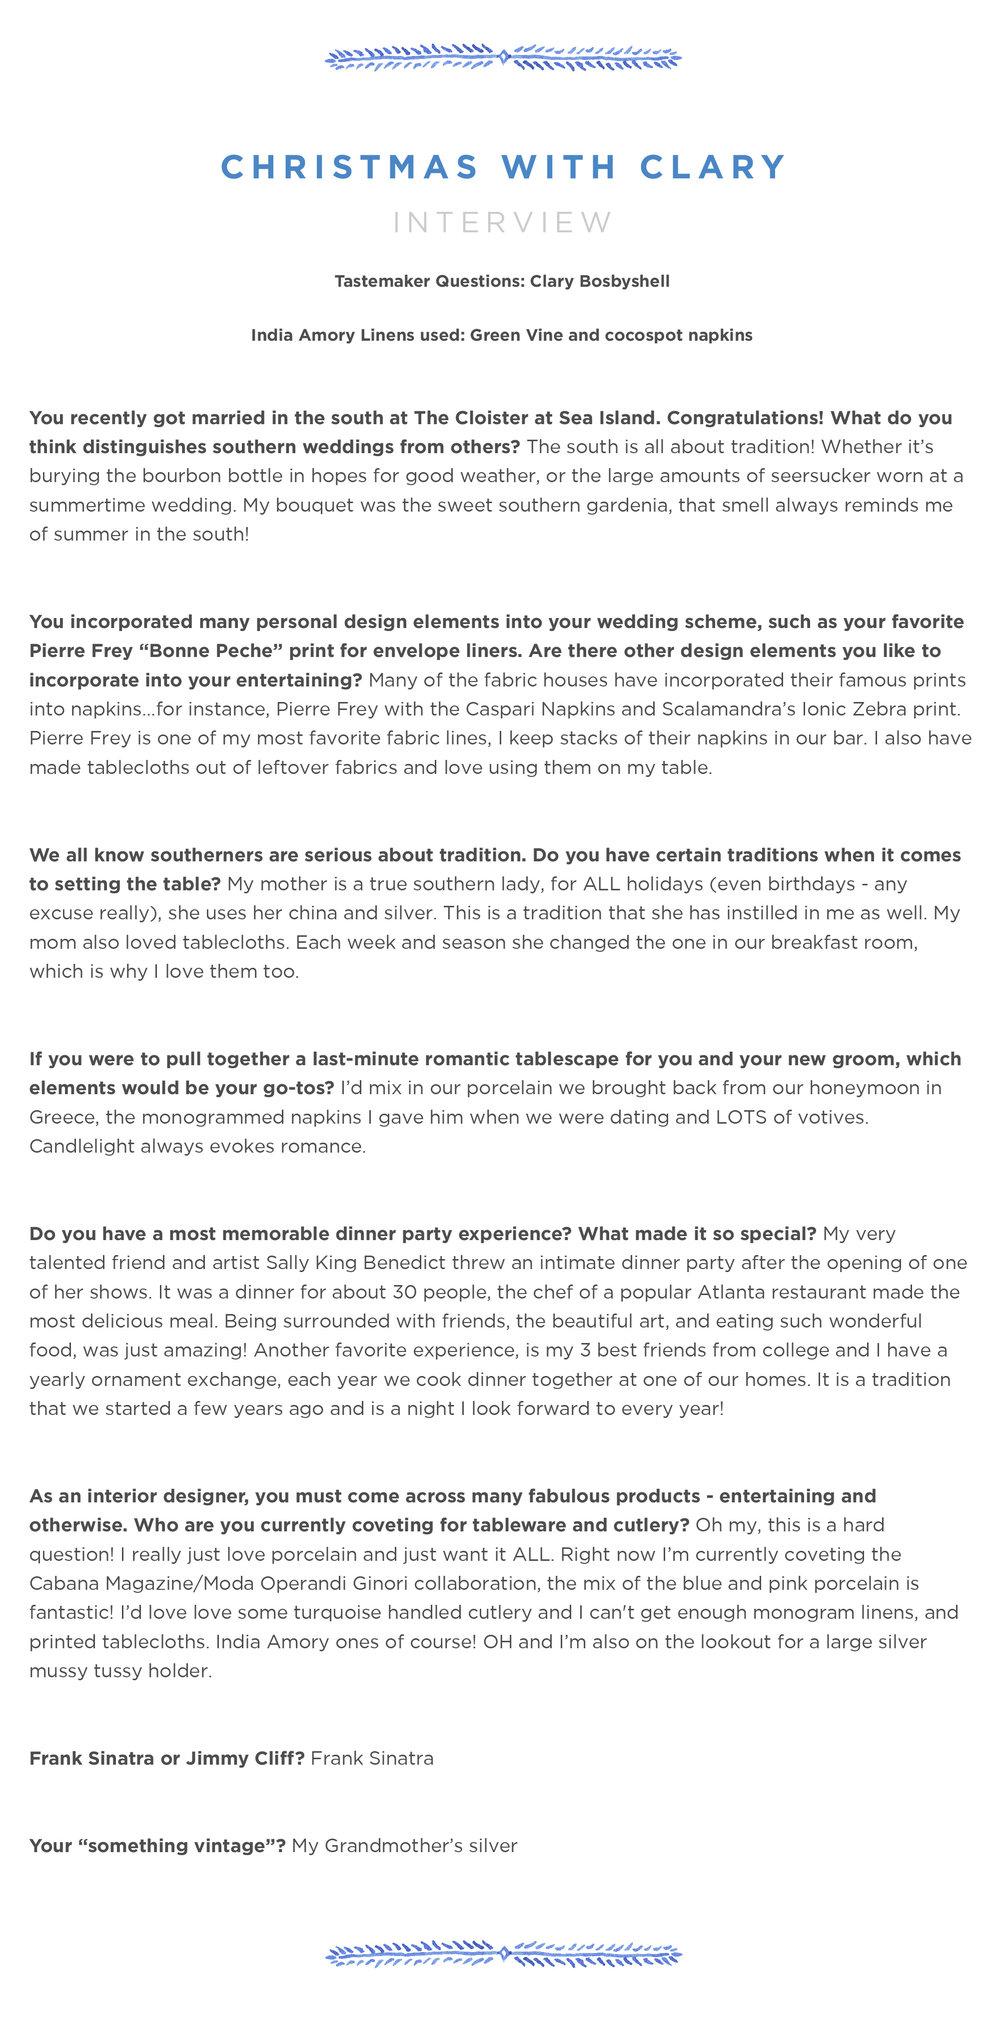 ClaryBosbyshell_Interview.jpg